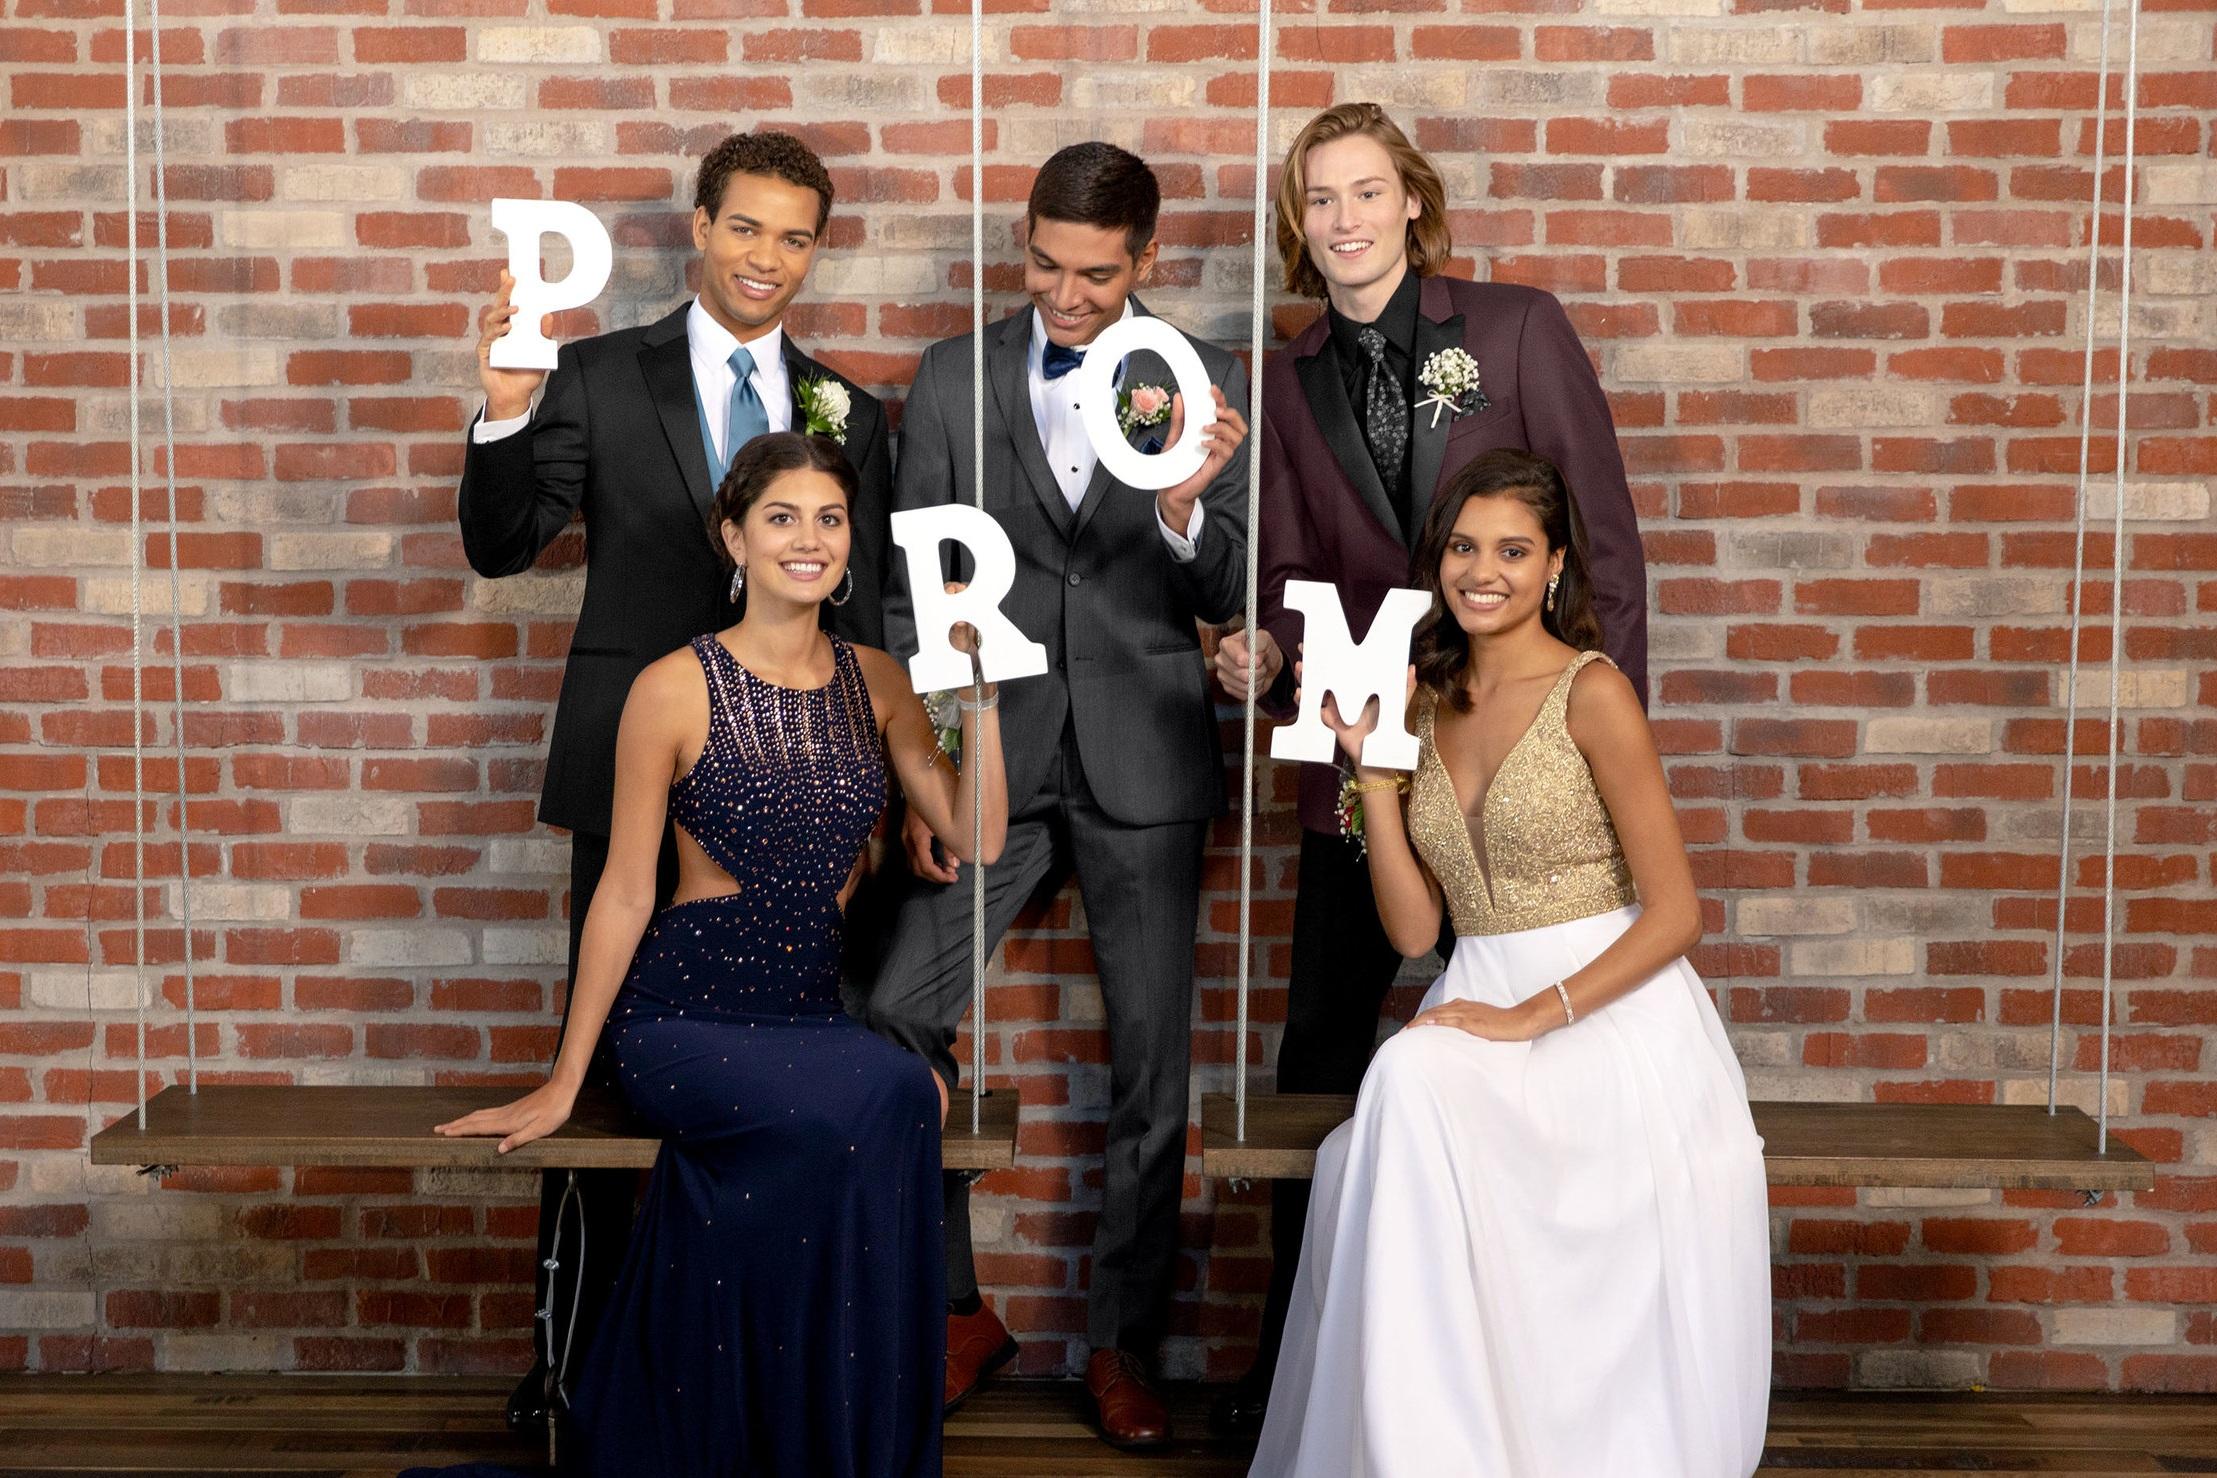 Group Prom.jpg